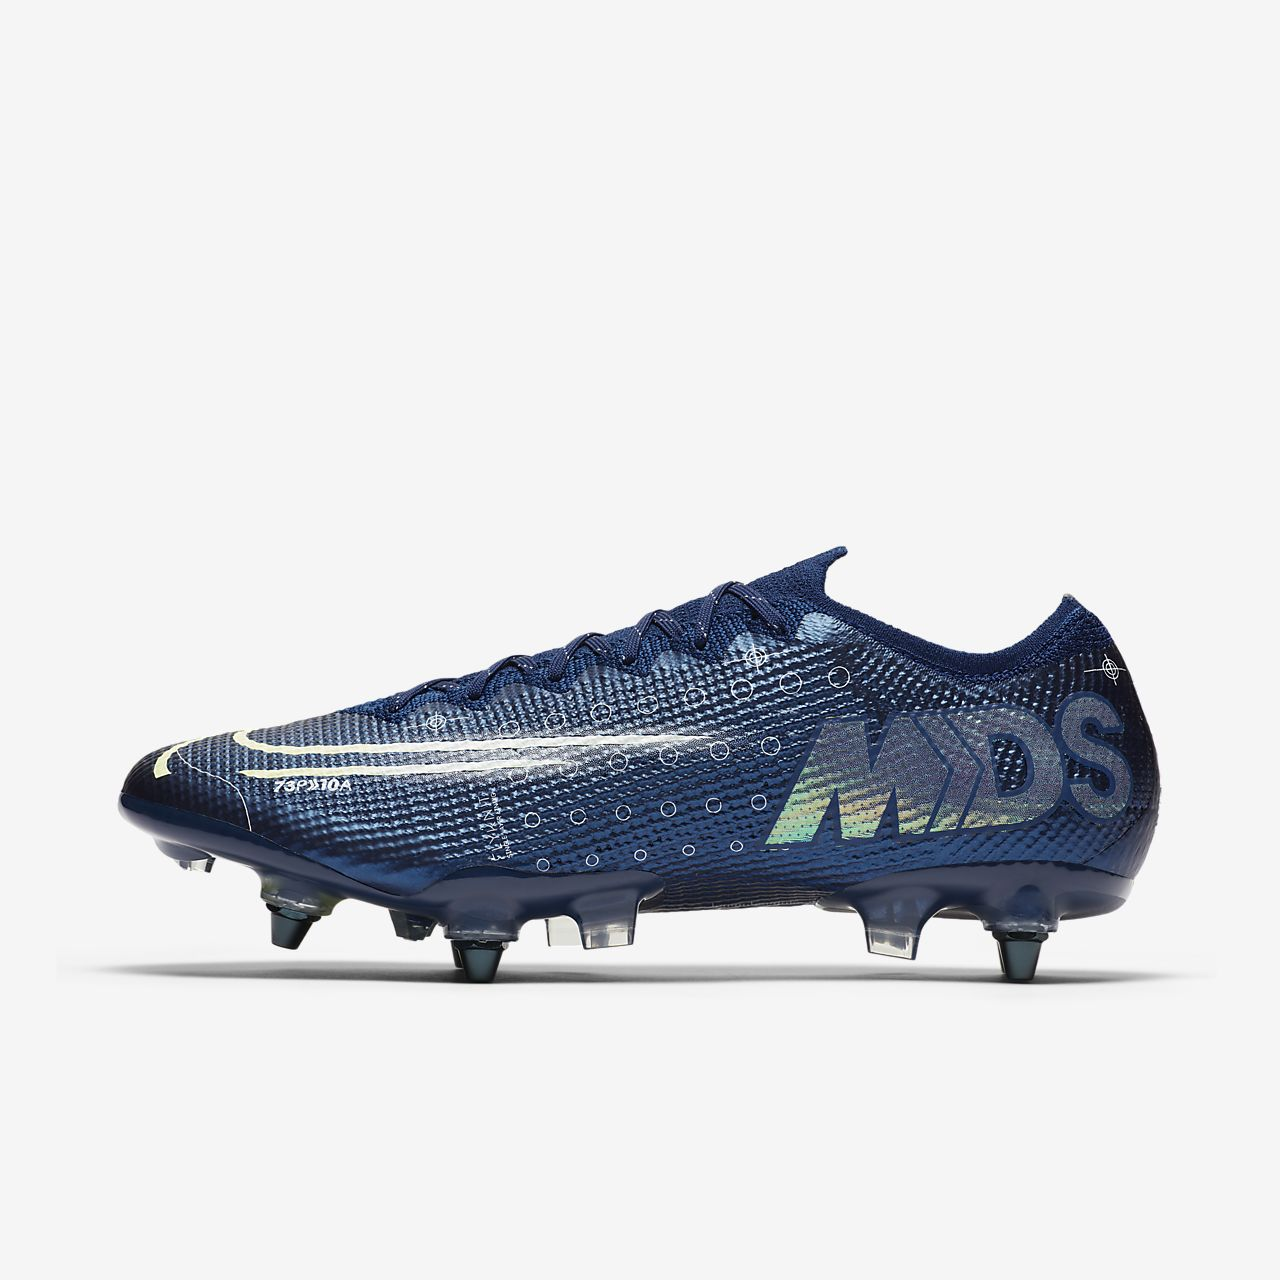 Nike Mercurial Vapor 13 Elite MDS SG-PRO Anti-Clog Traction Botes de futbol per a terreny tou